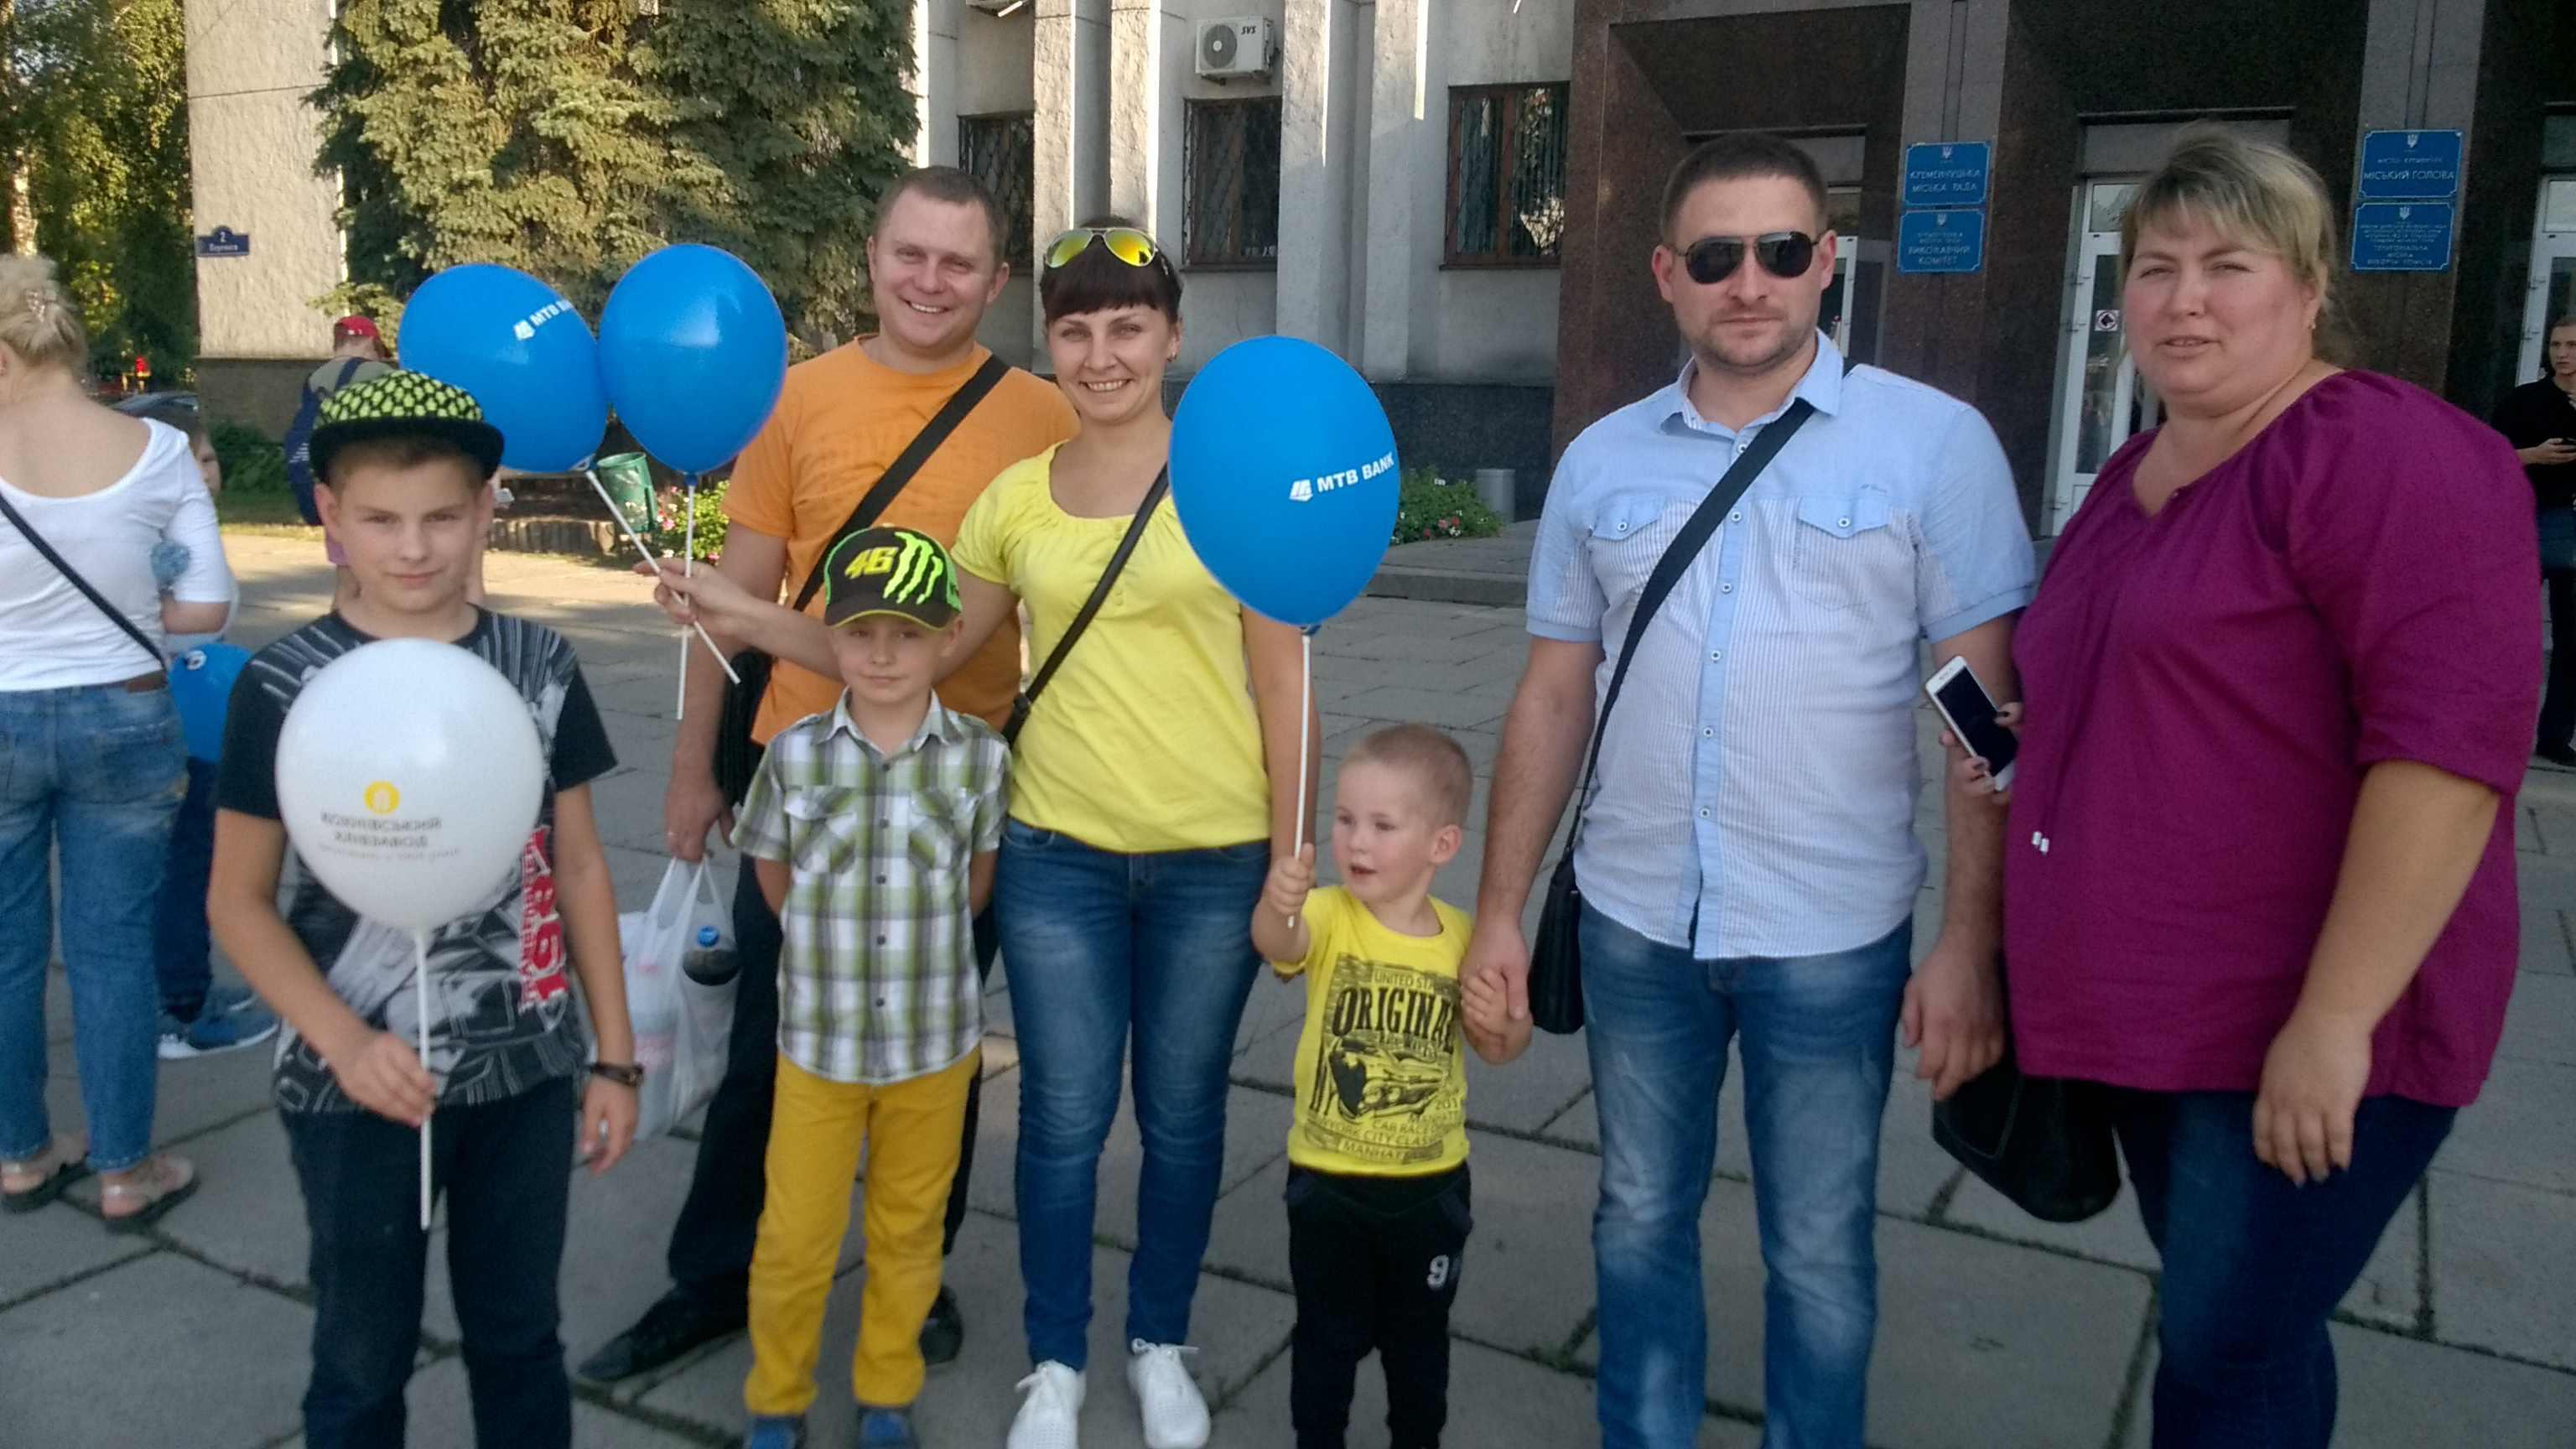 ДЕНЬ КРЕМЕНЧУГА – С МТБ БАНКом! - фото 5 - mtb.ua